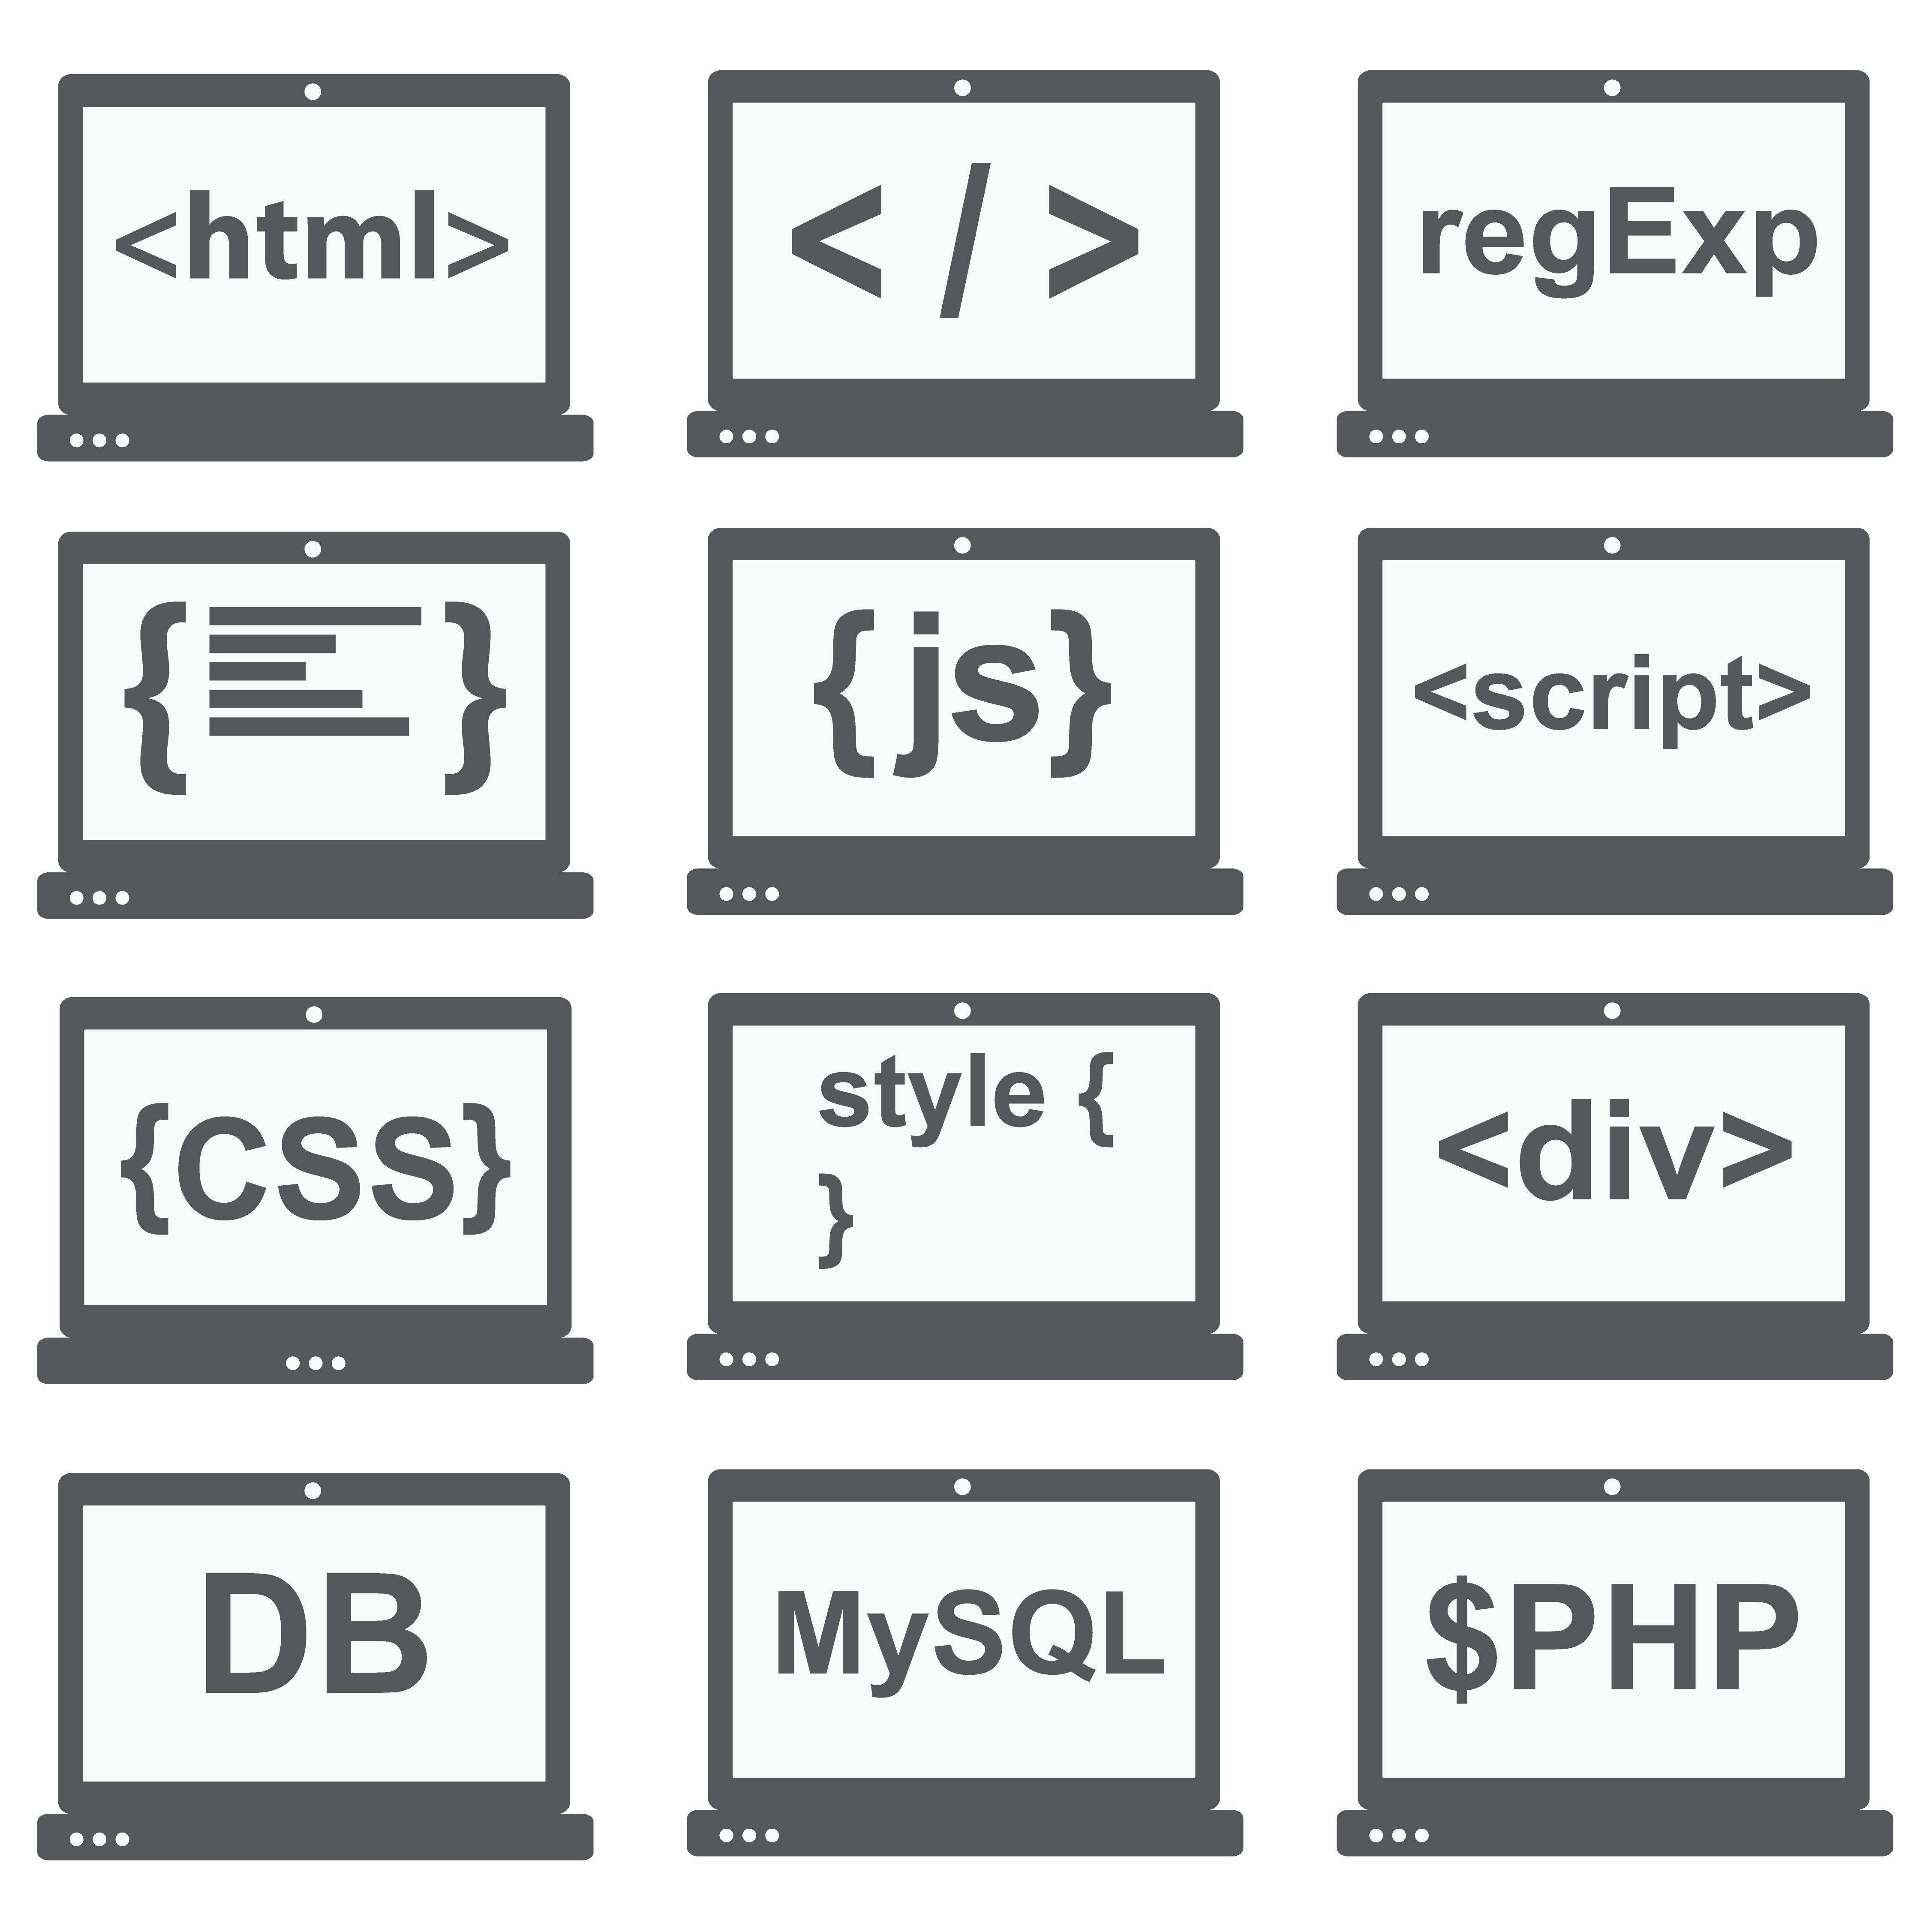 web-technology-soup-html-javascript-css-php